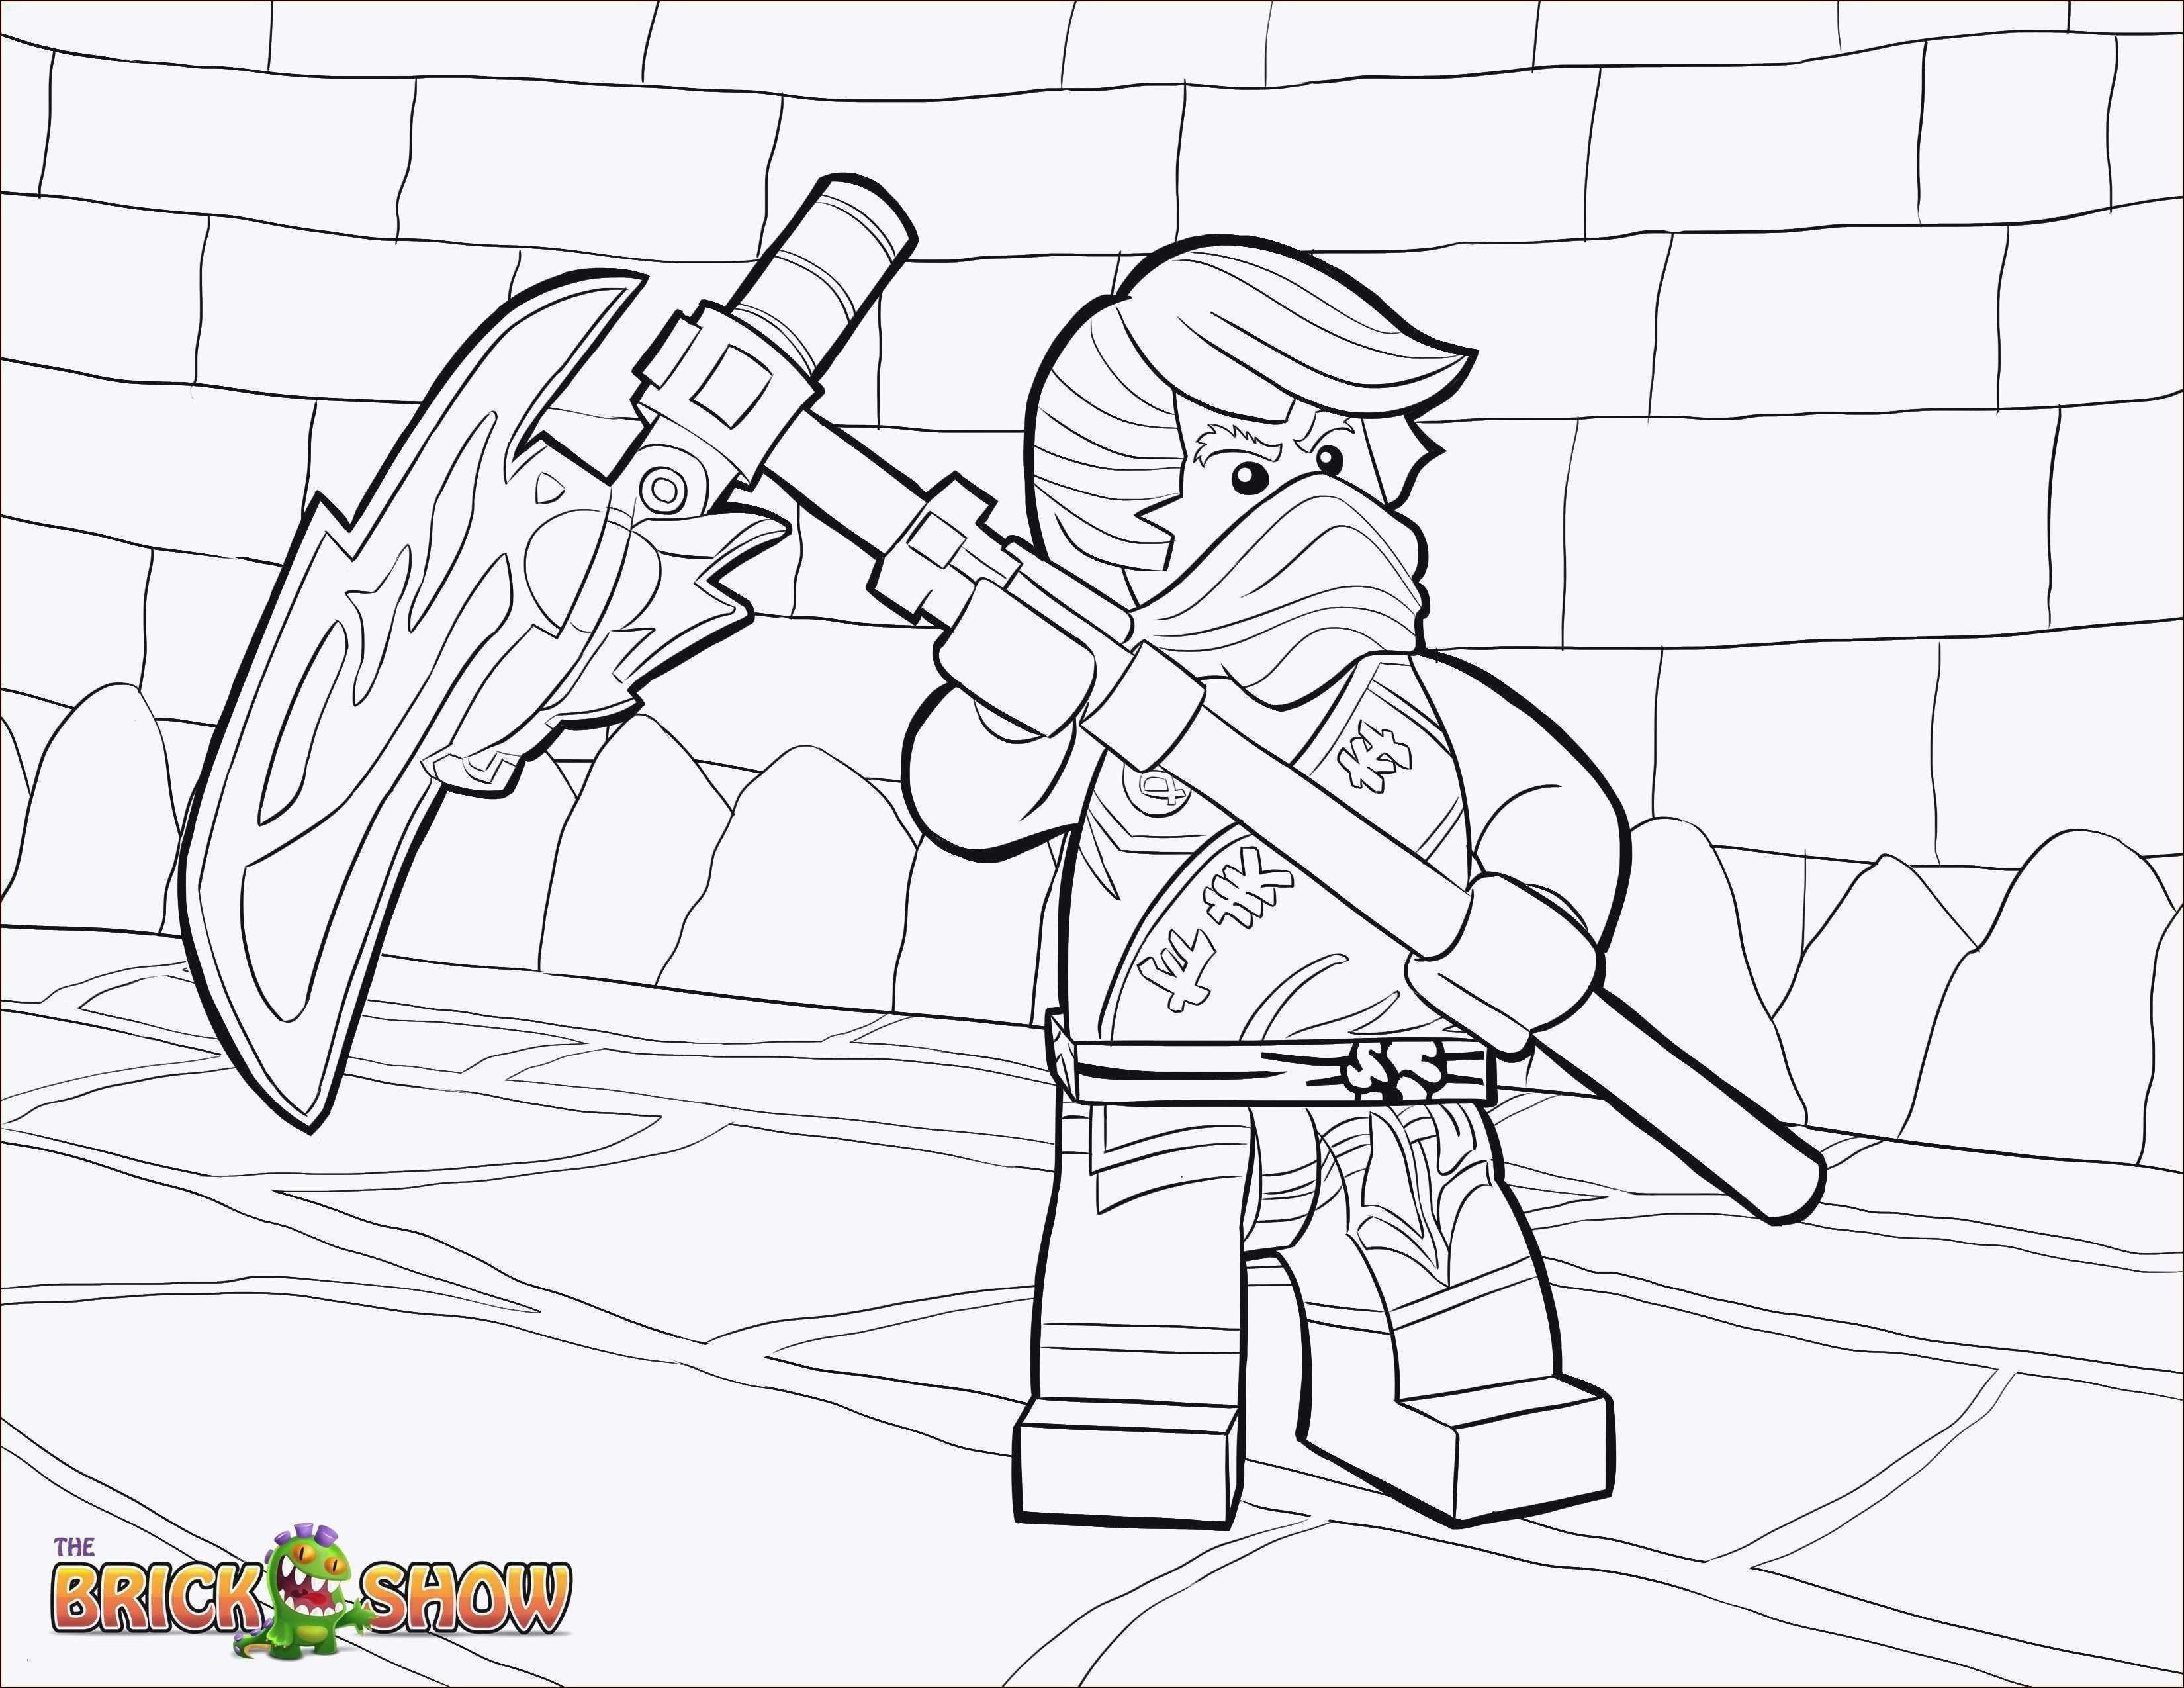 Ninjago Ausmalbilder Kai Inspirierend Lego Ninjago Ausmalbilder Kai Vorstellung Verschiedene Bilder Färben Fotos